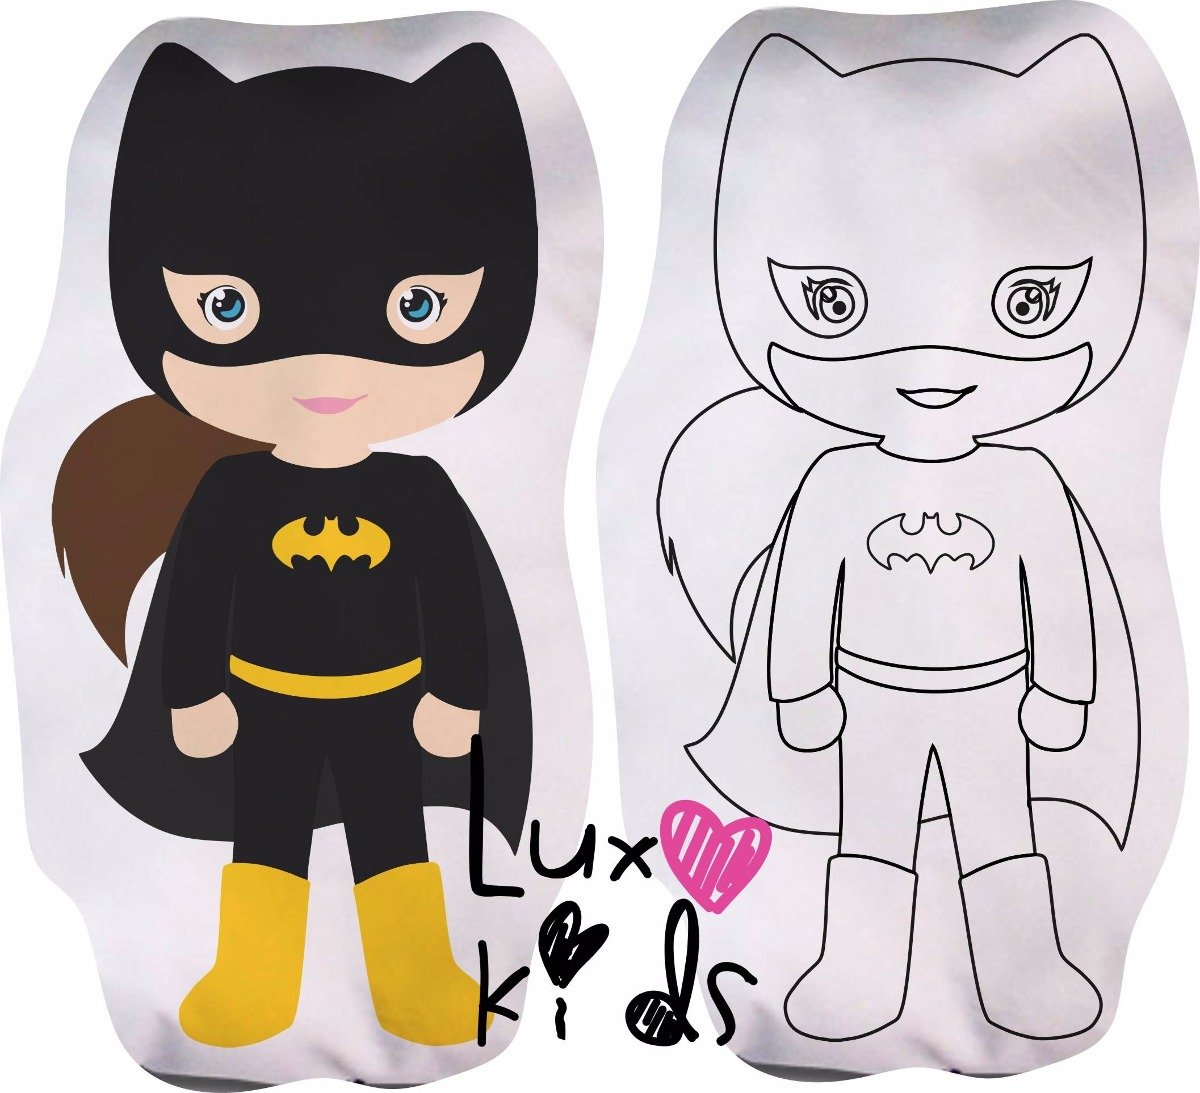 Almofada Para Colorir Batgirl R 355 00 Em Mercado Livre